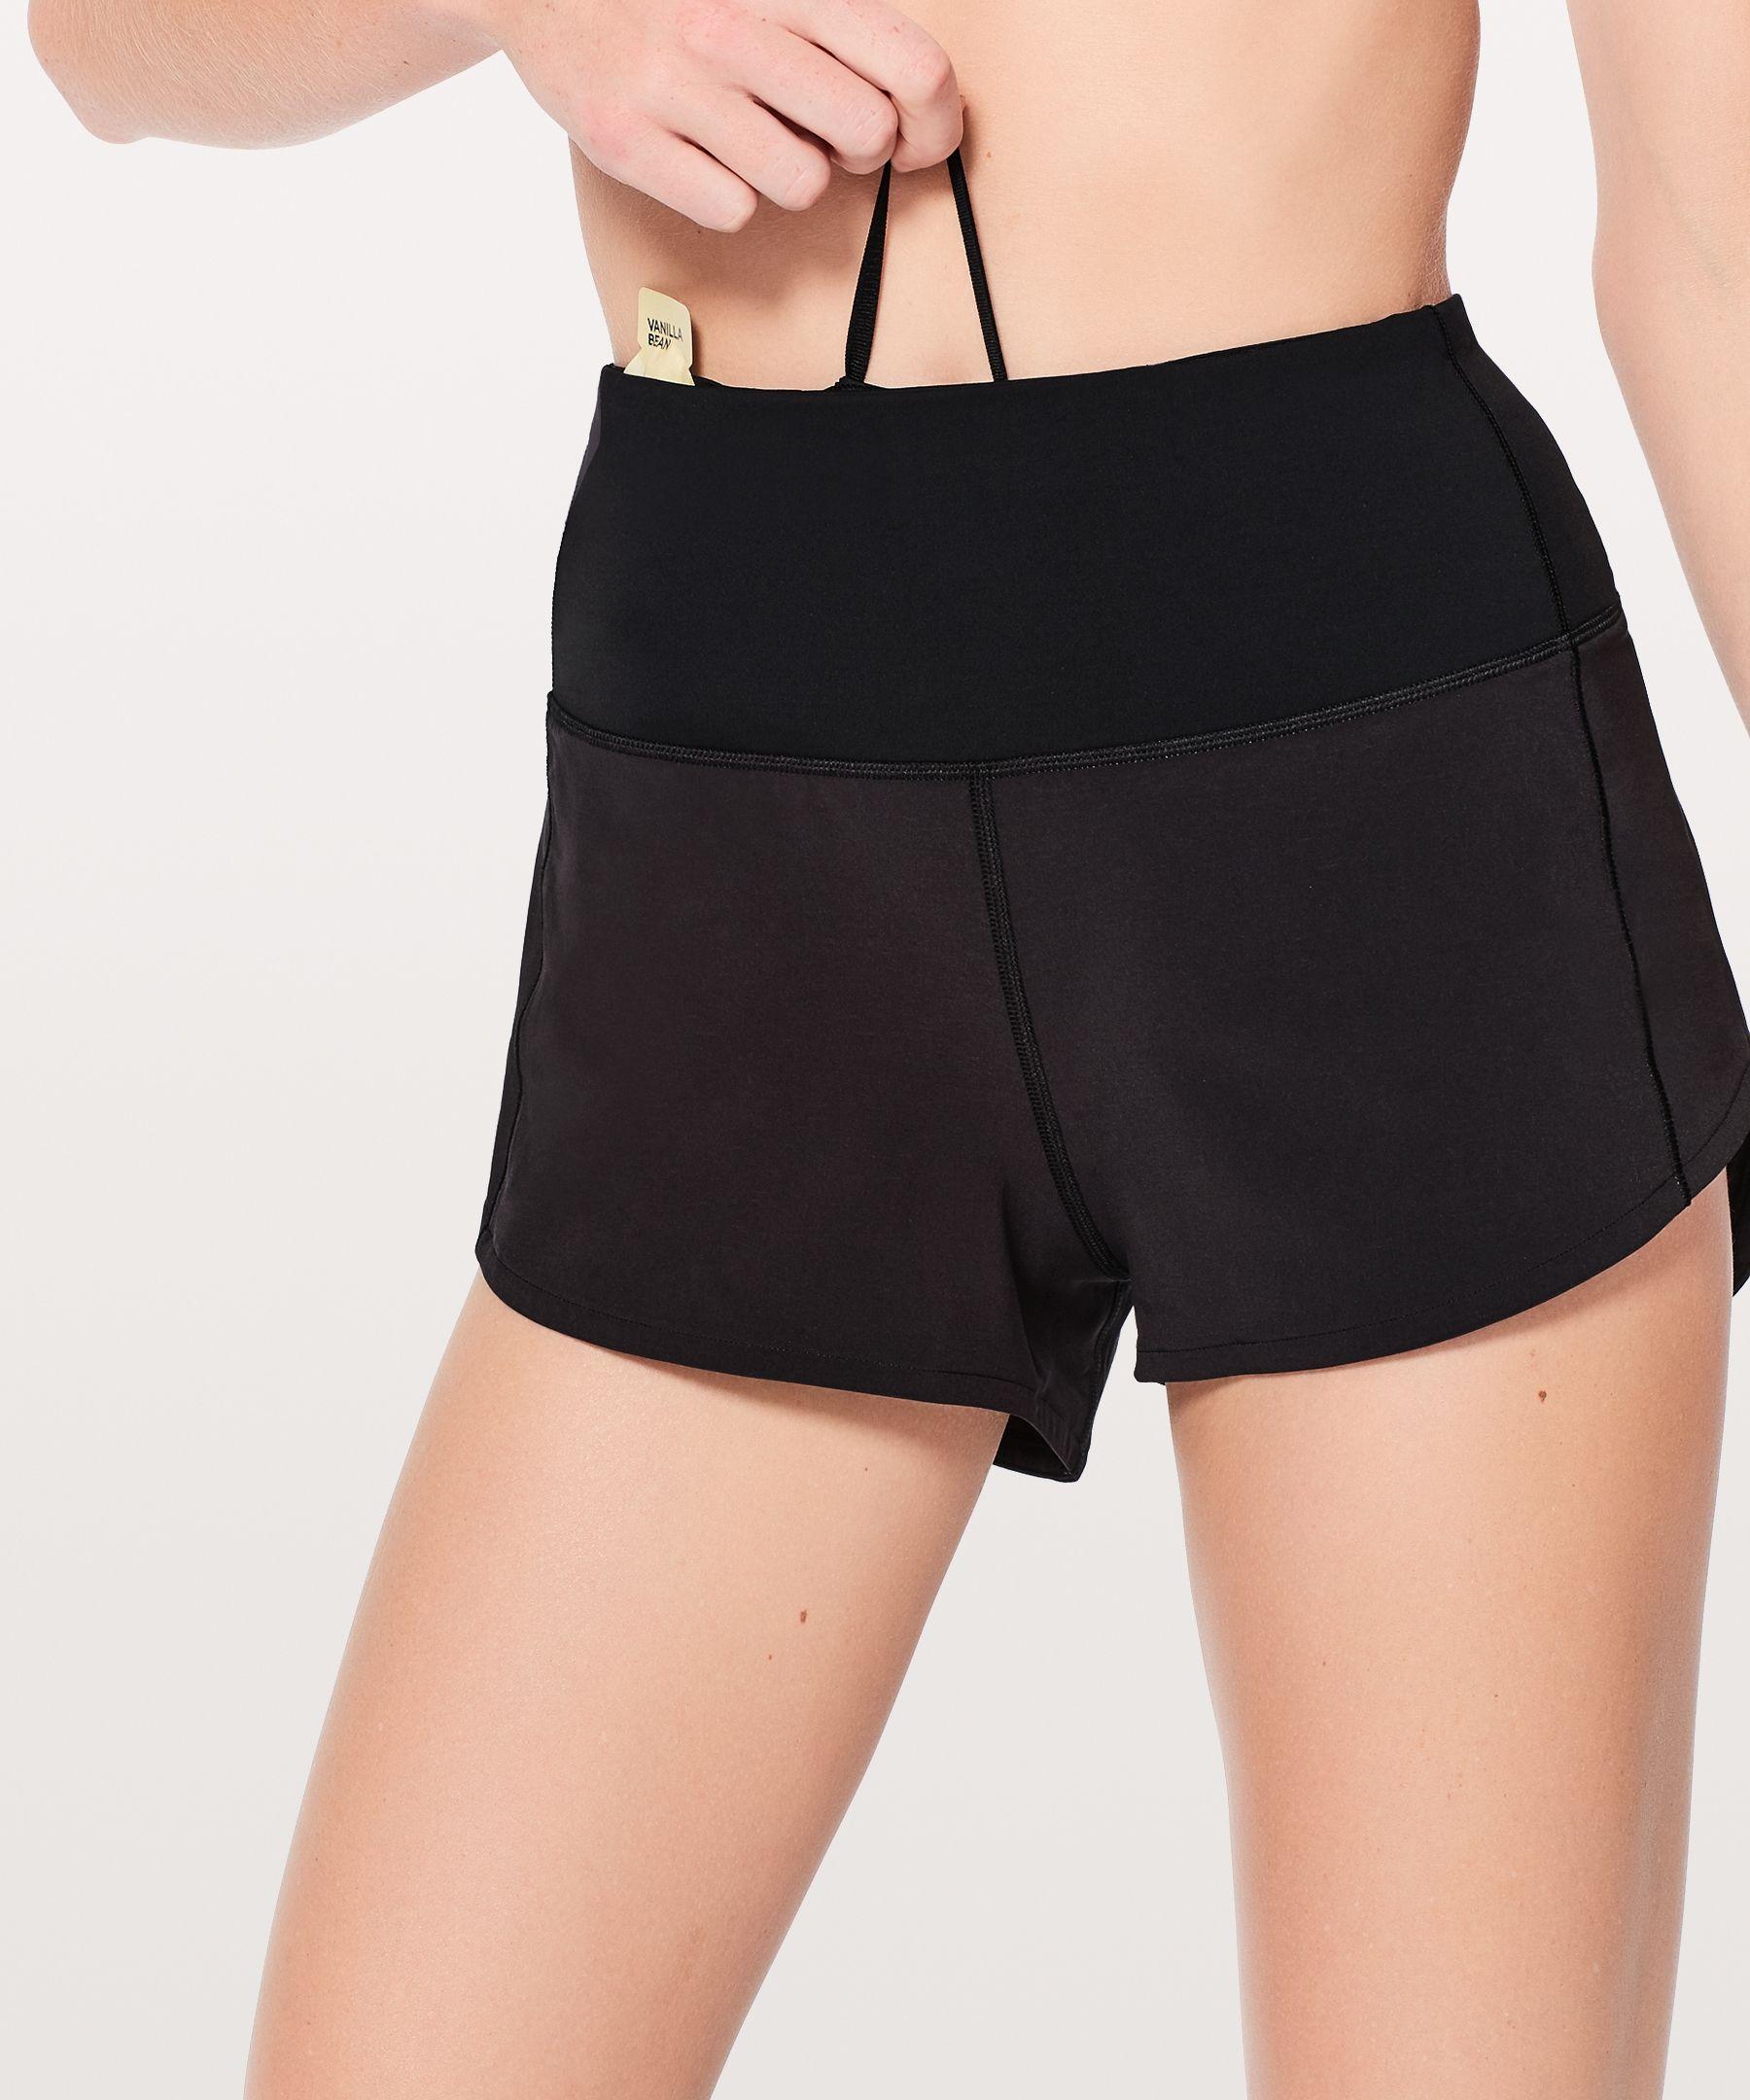 Speed Up Short High Rise 2 5 Women S Shorts Lululemon Womens Shorts High Shorts Lululemon